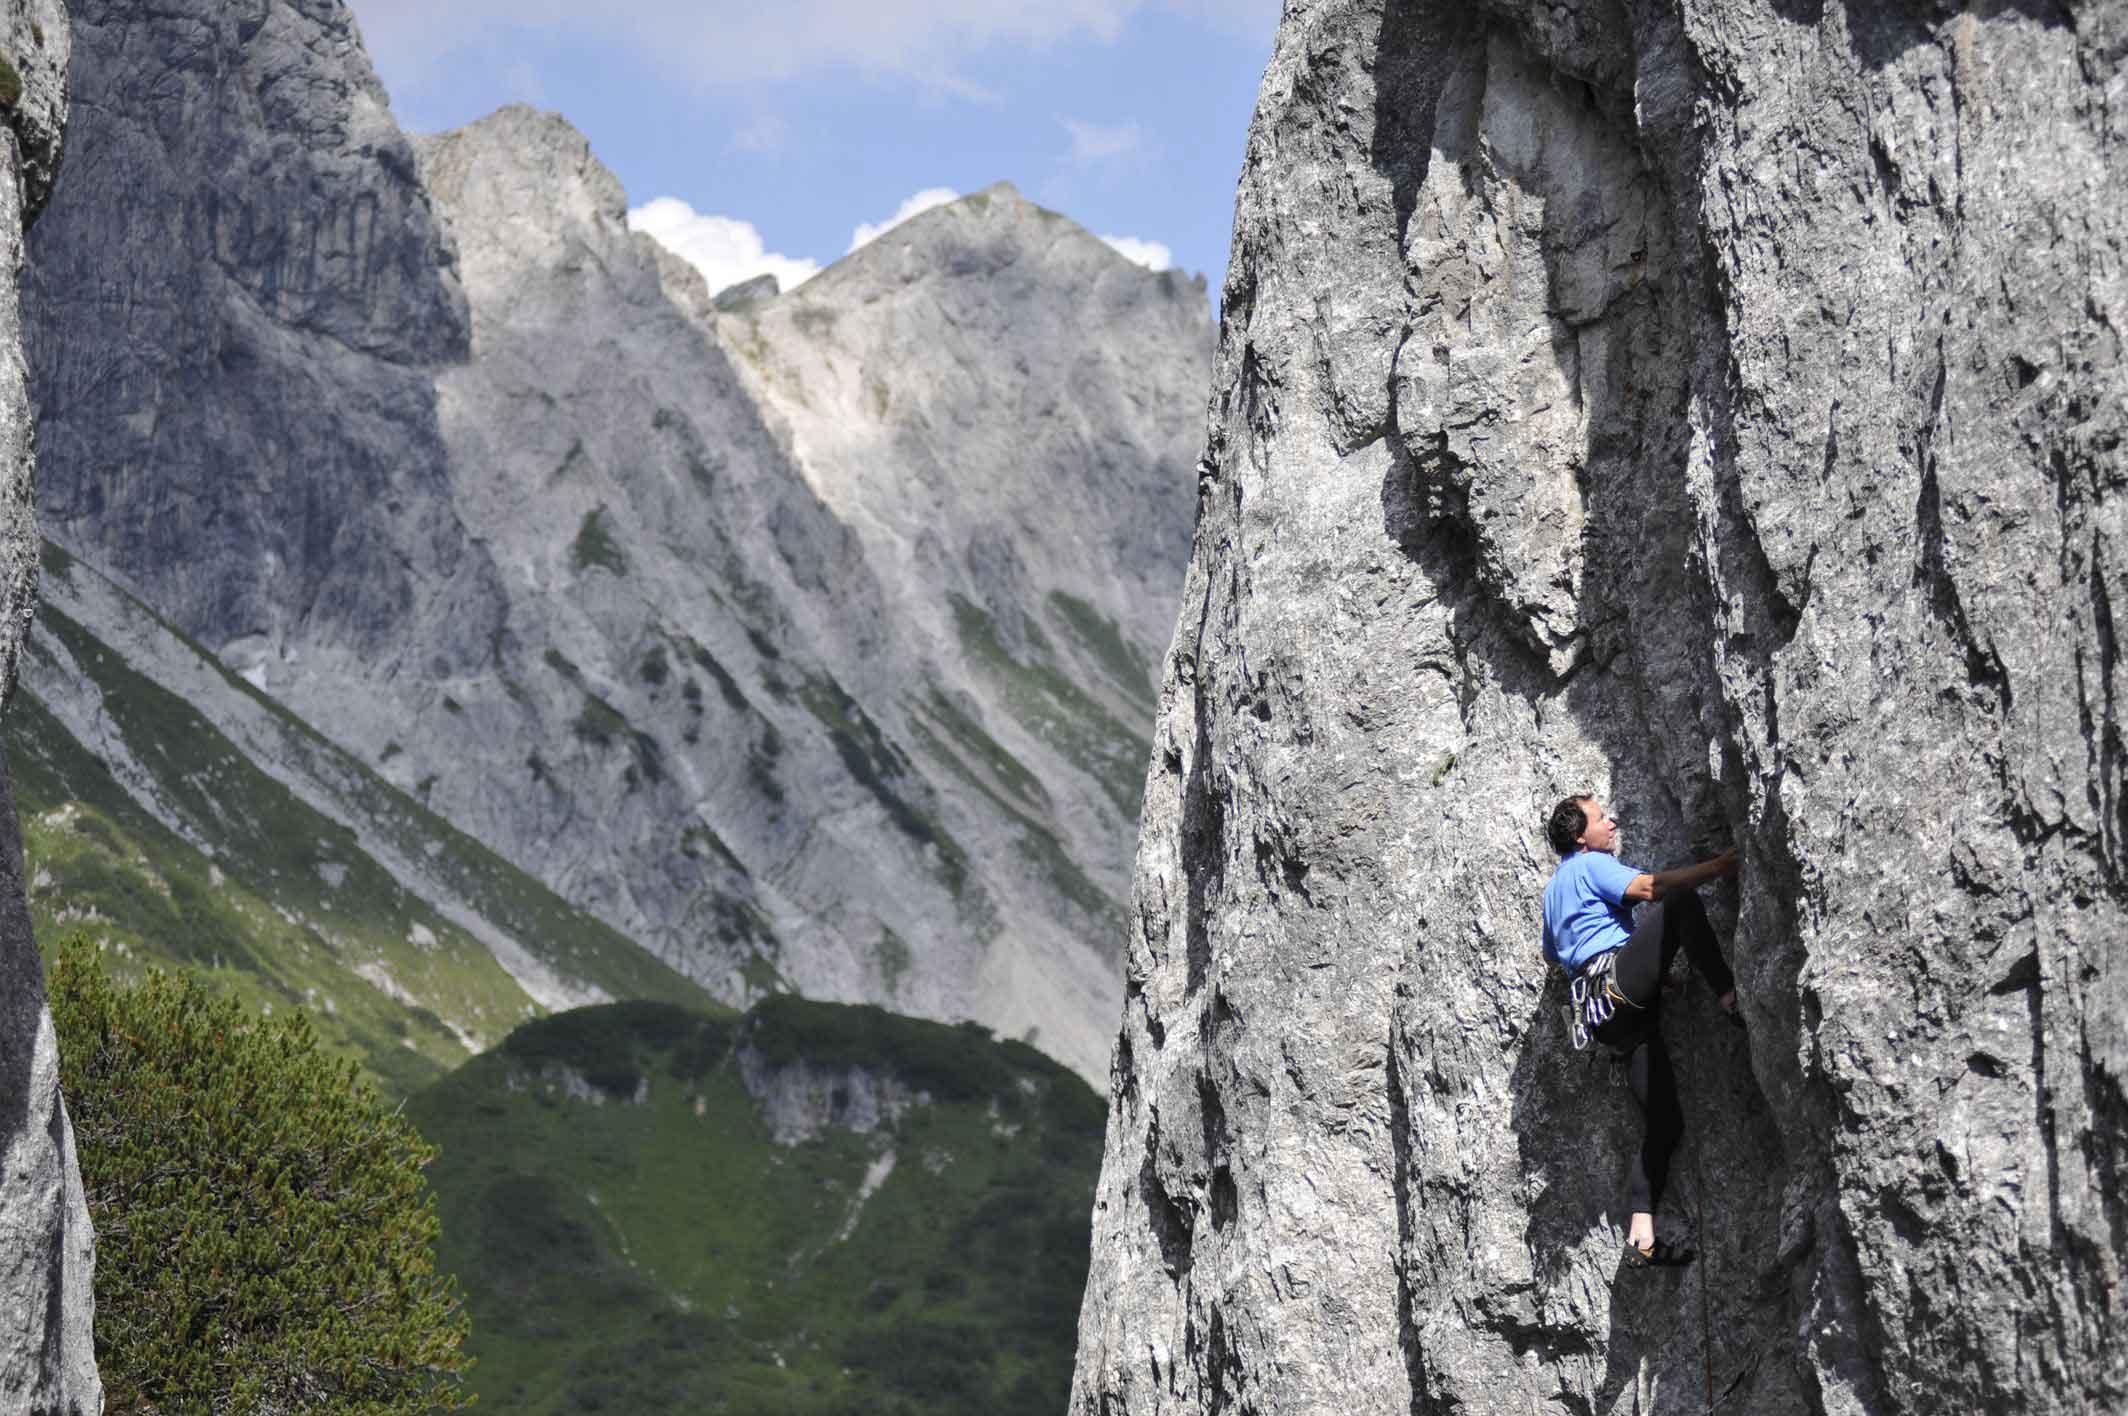 Klettersteig Johann Topo : Klettersteige klettergarten filzmoos